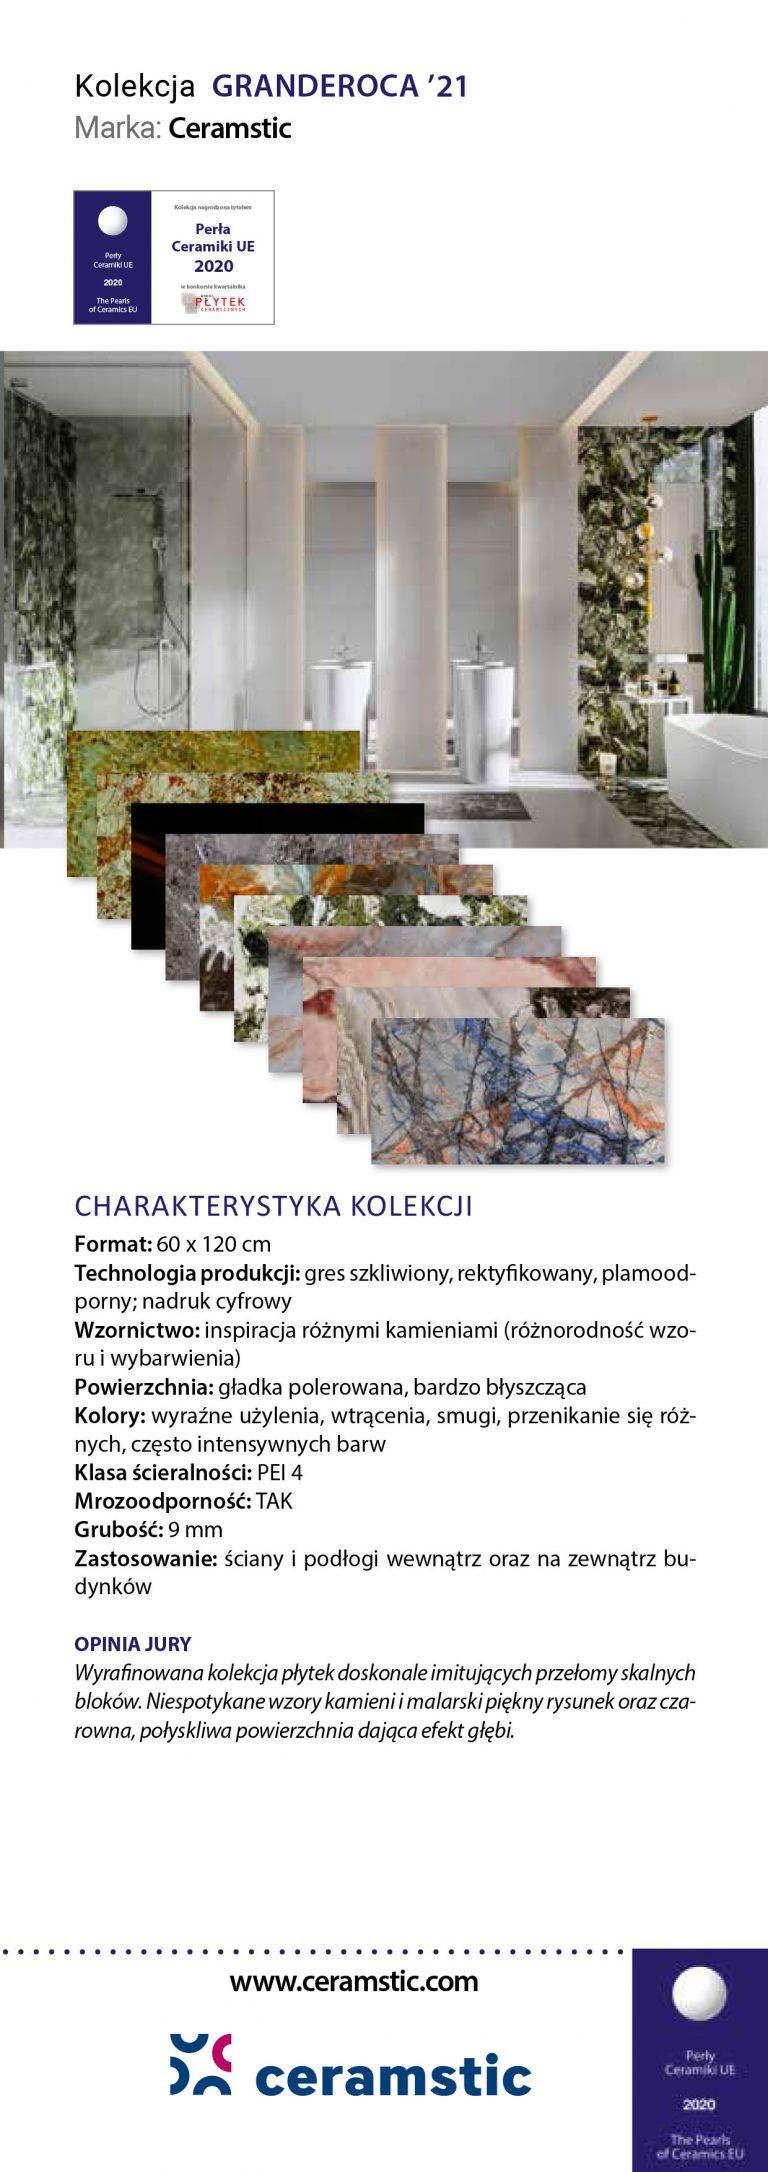 Ceramstic Granderoca'21 Perły Ceramiki 2020